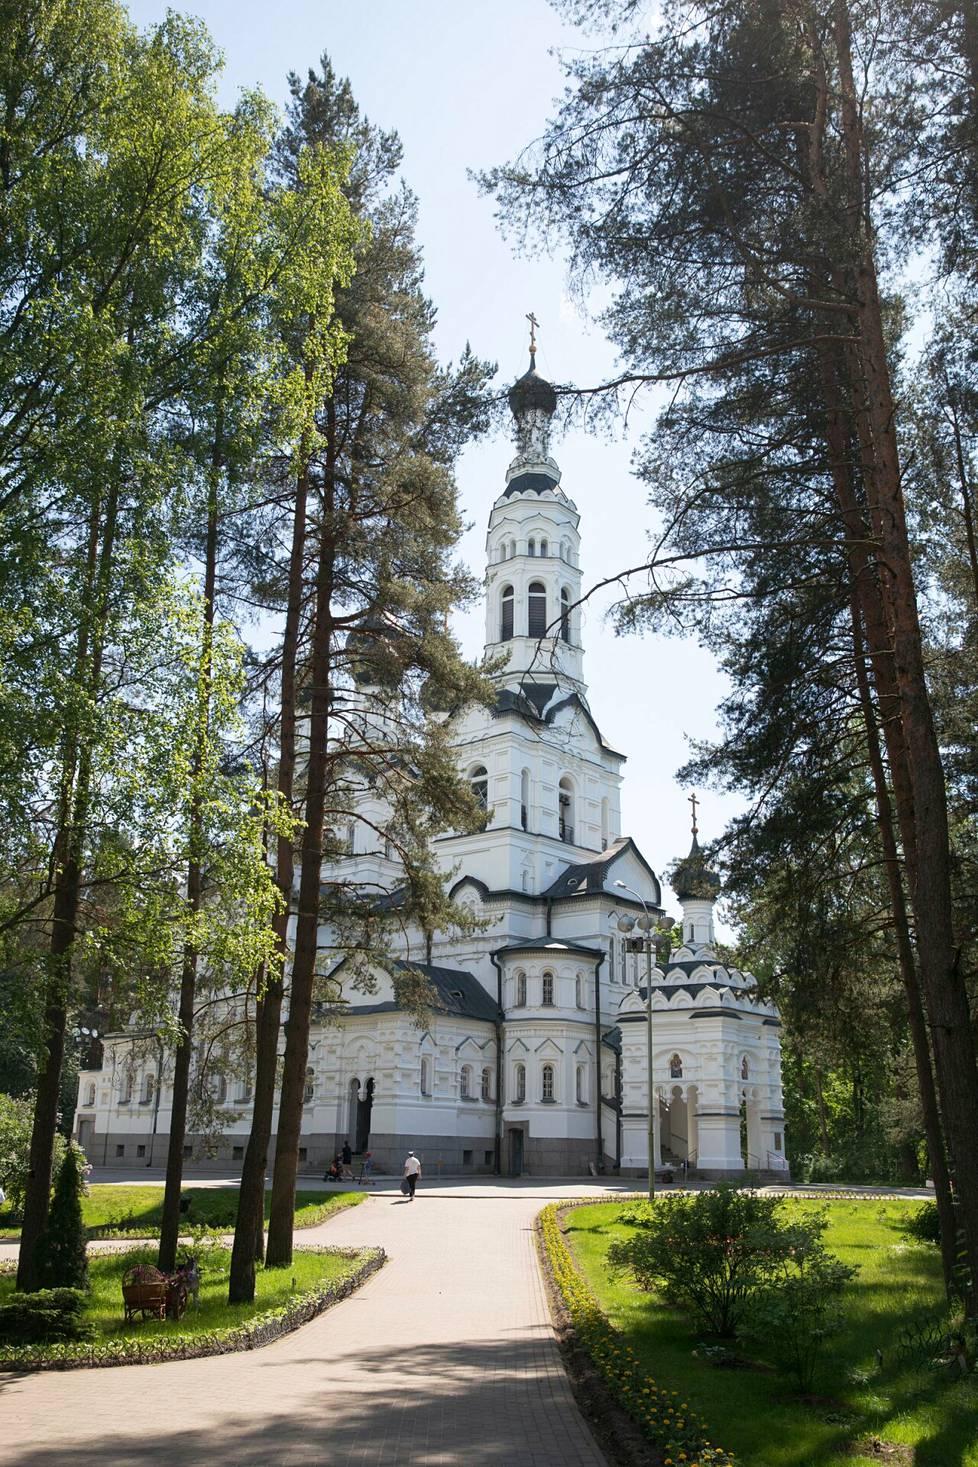 Terijoen ortodoksinen kirkko.